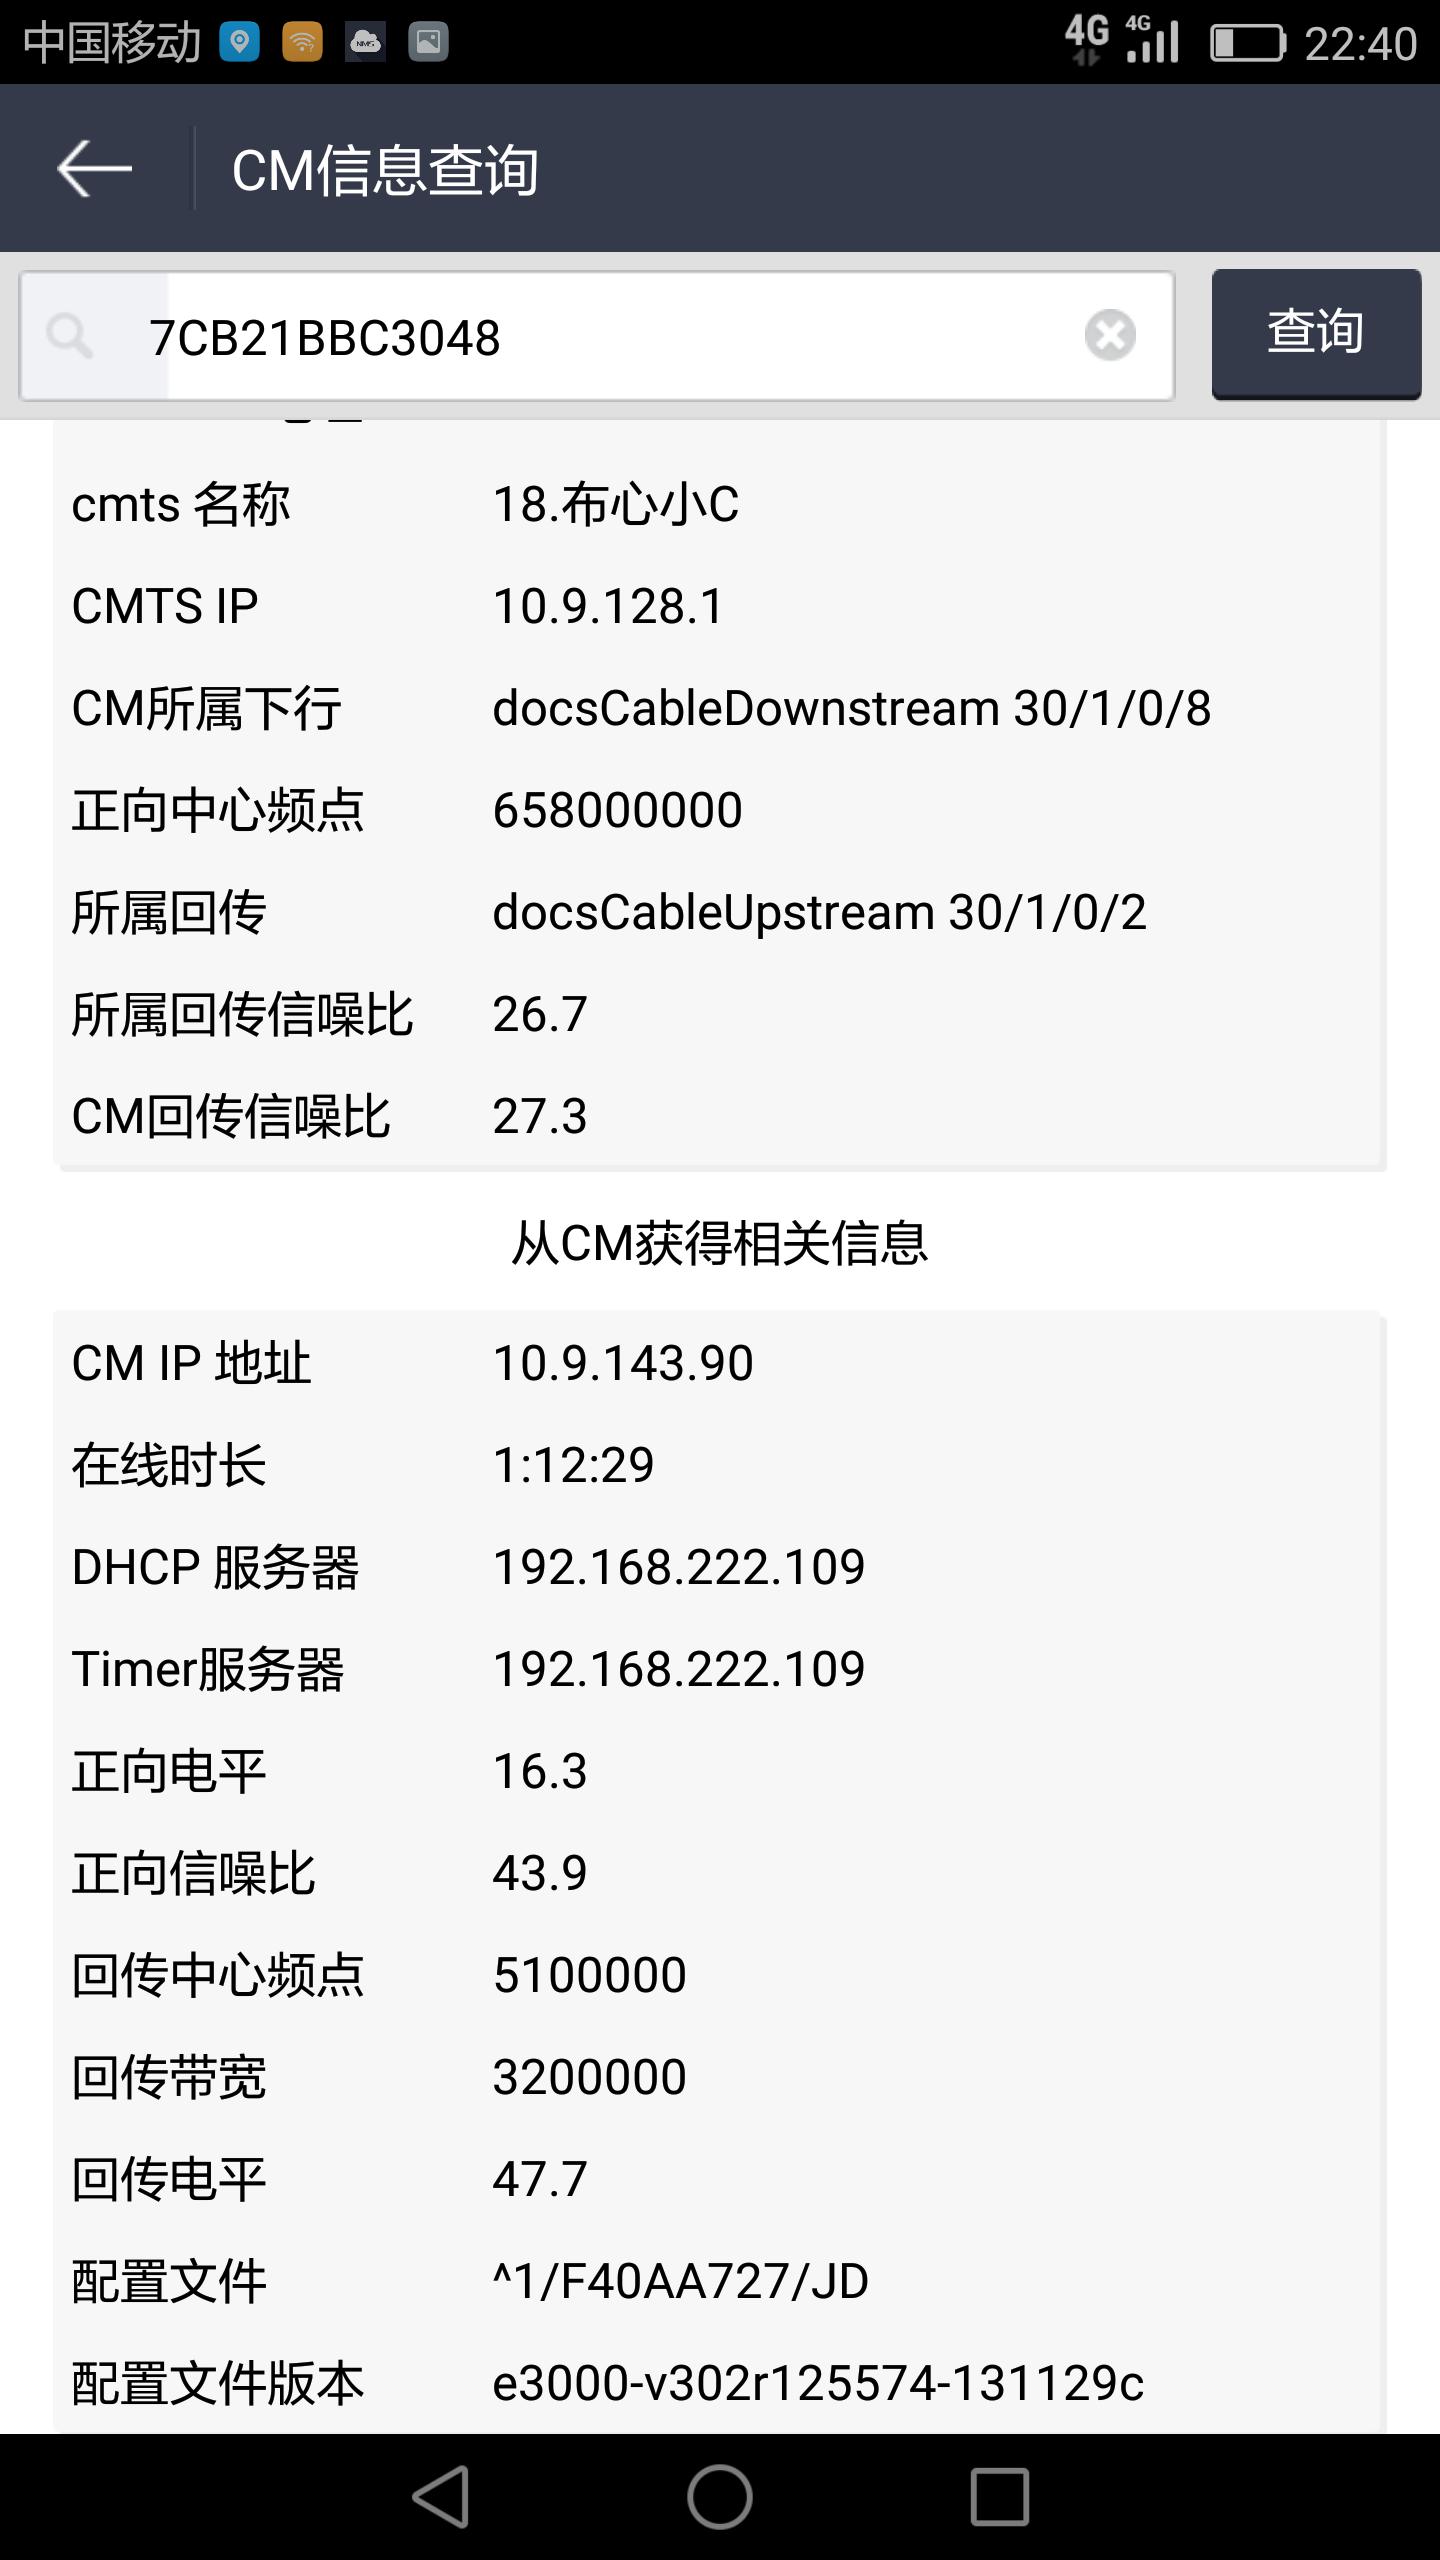 Screenshot_2017-03-10-22-40-51.png